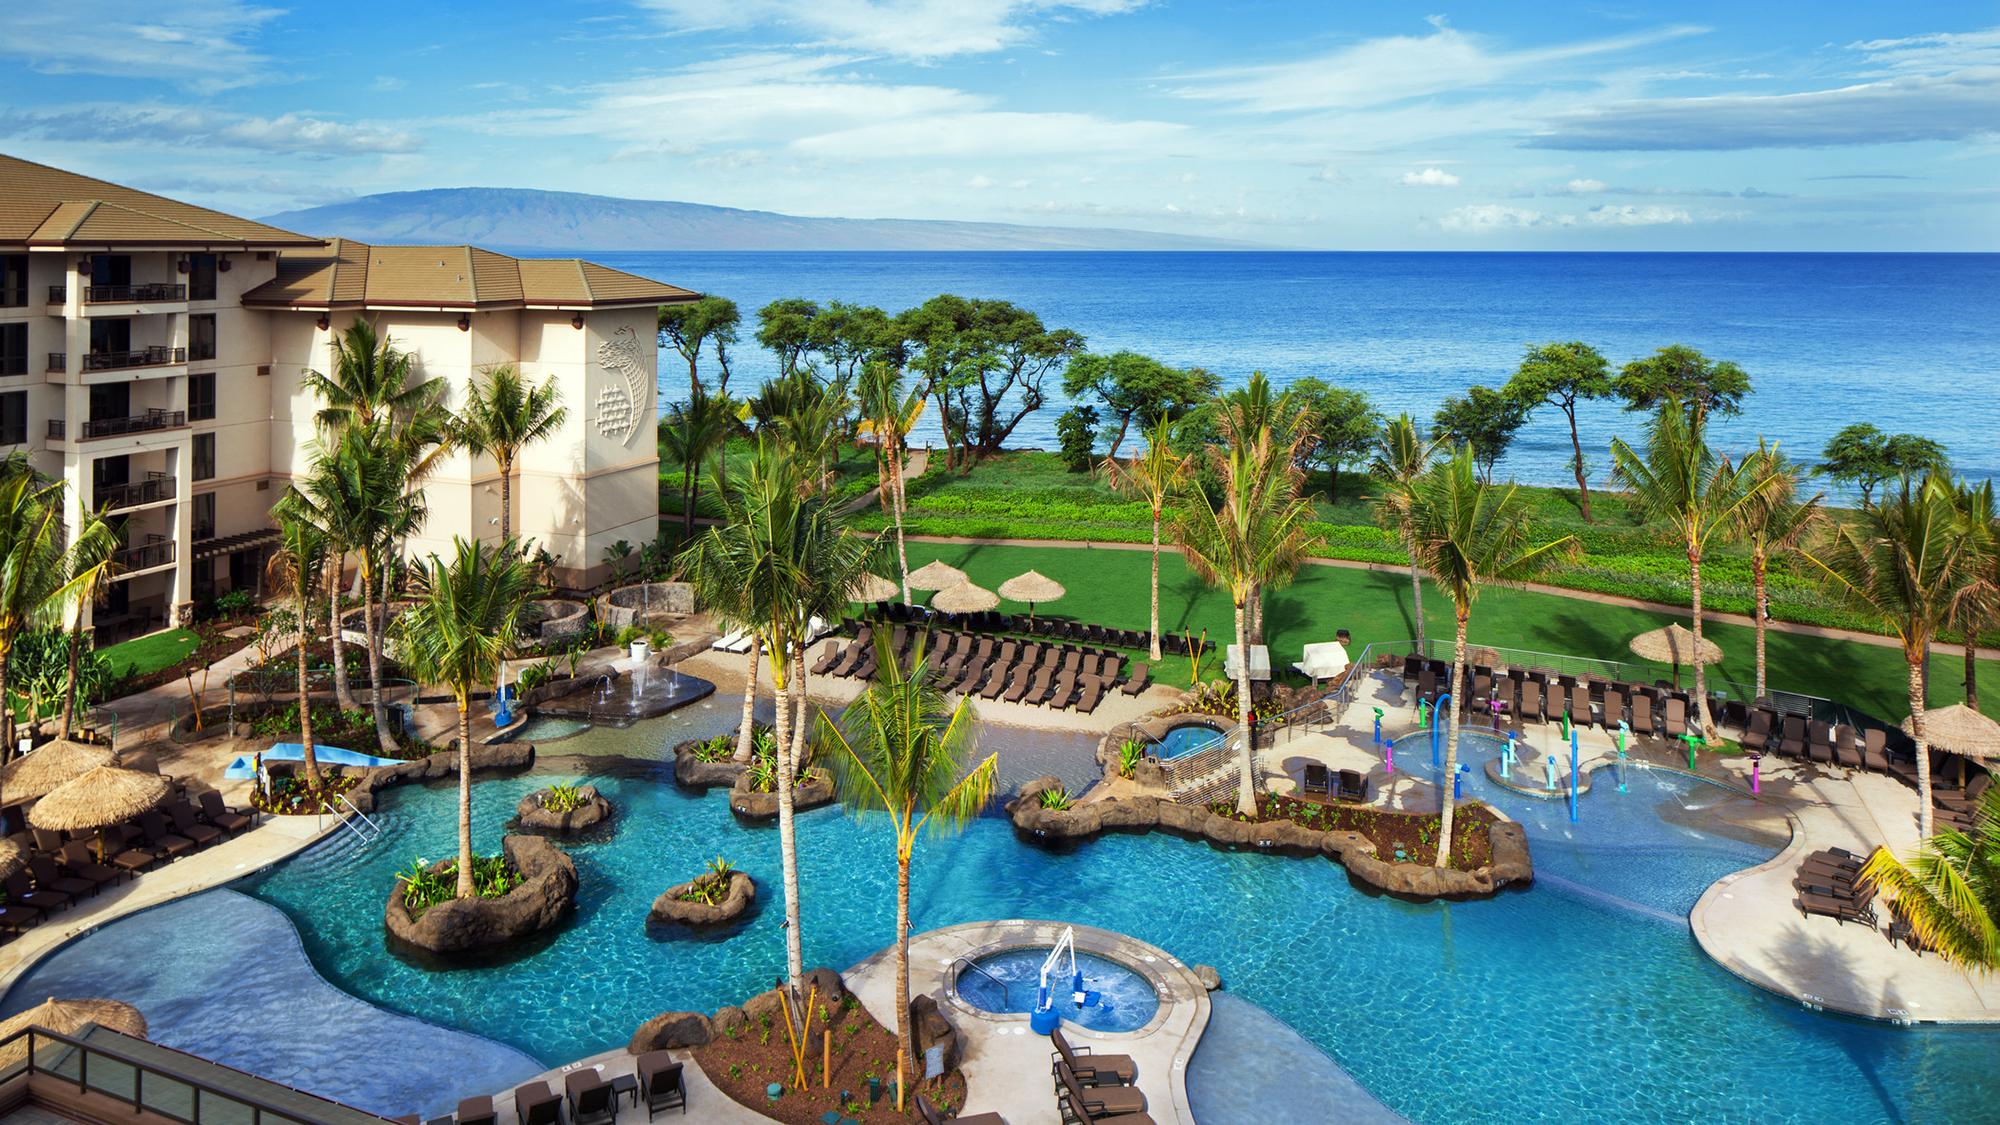 Marriott Vacations to buy ILG for $4.7 billion